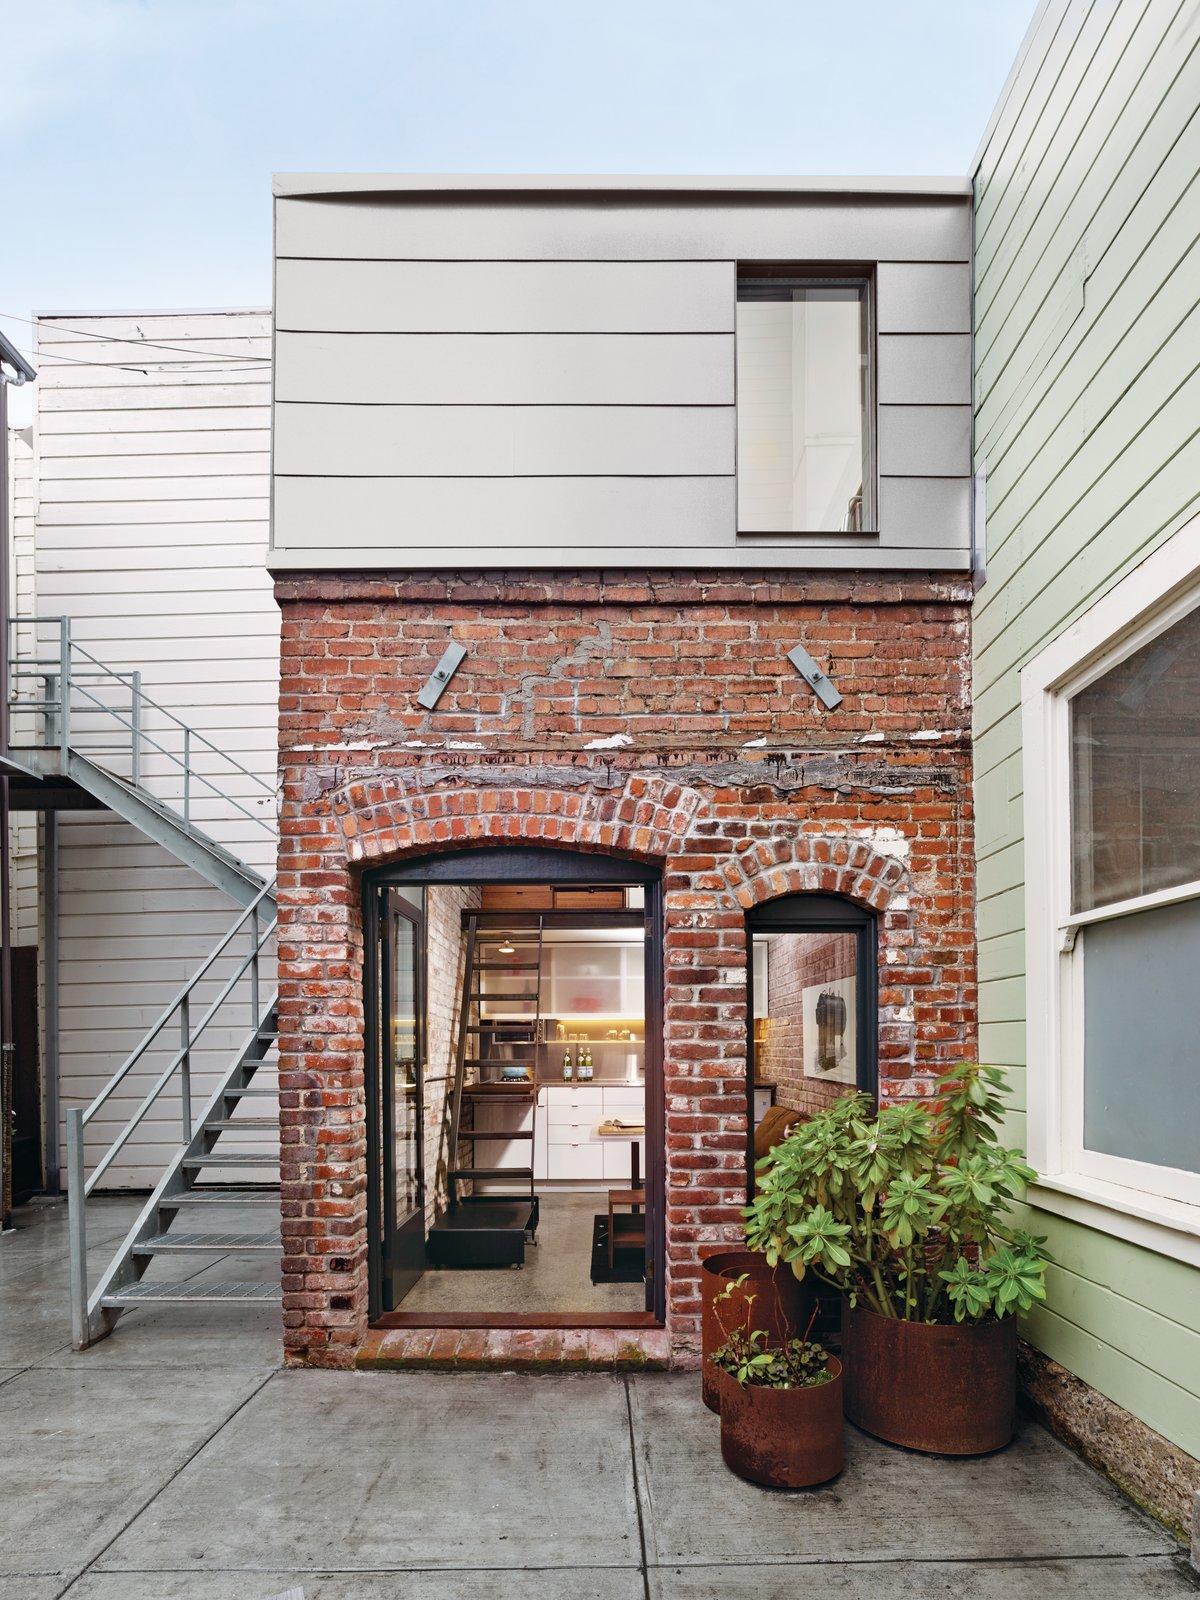 #smallspaces #brick #boilerroom #exterior #outside #outdoor #landscape #plants #SanFrancisco #guesthouse #stairs #ladder #ChristiAzevedo